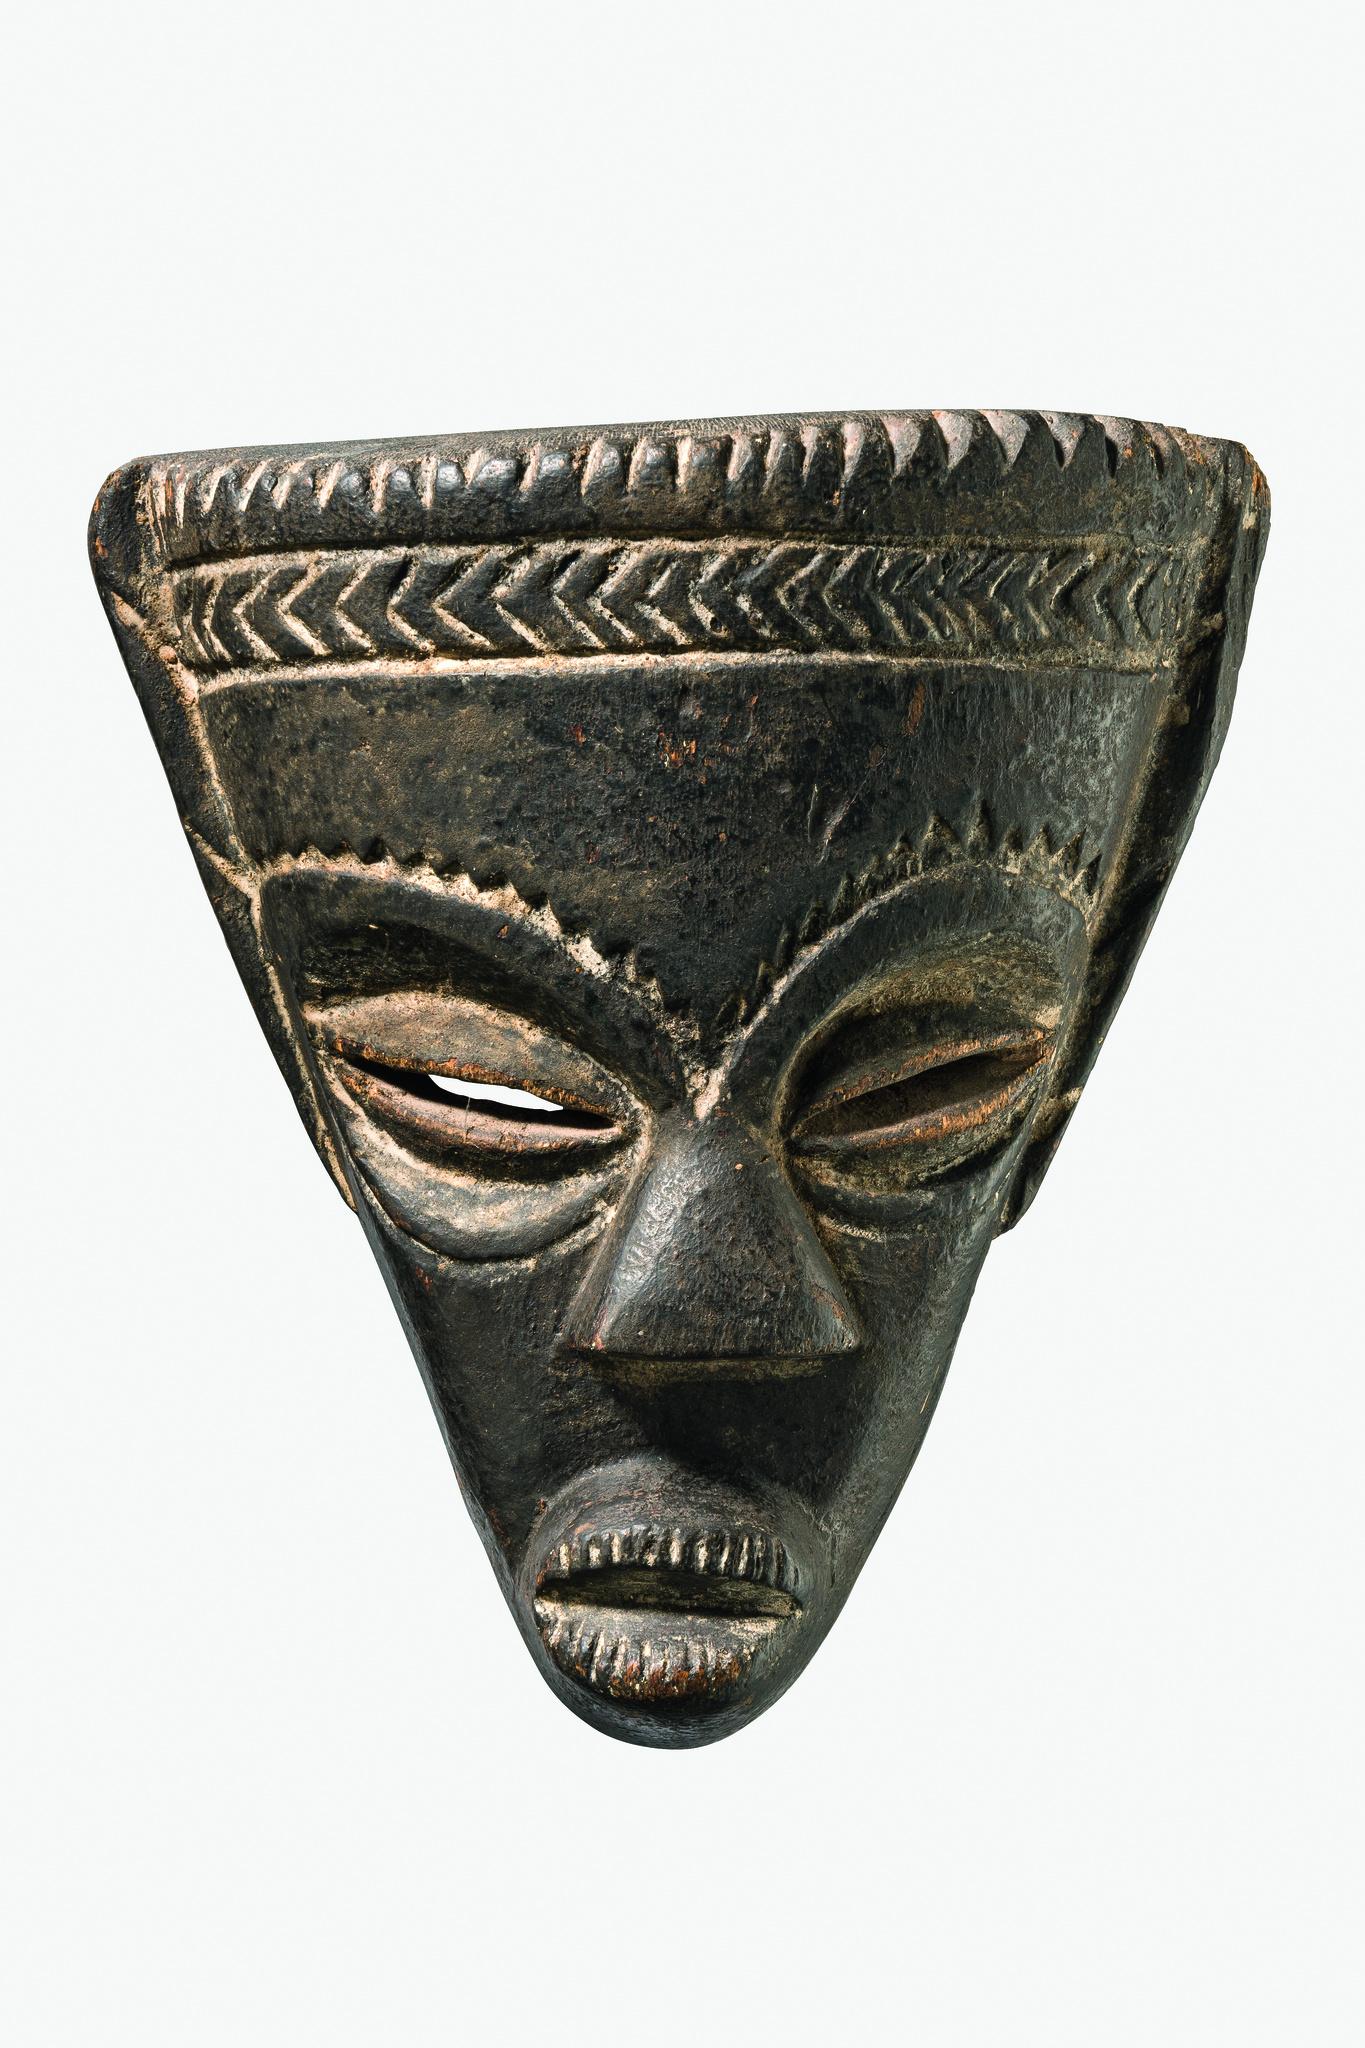 Small anthropomorphic mask